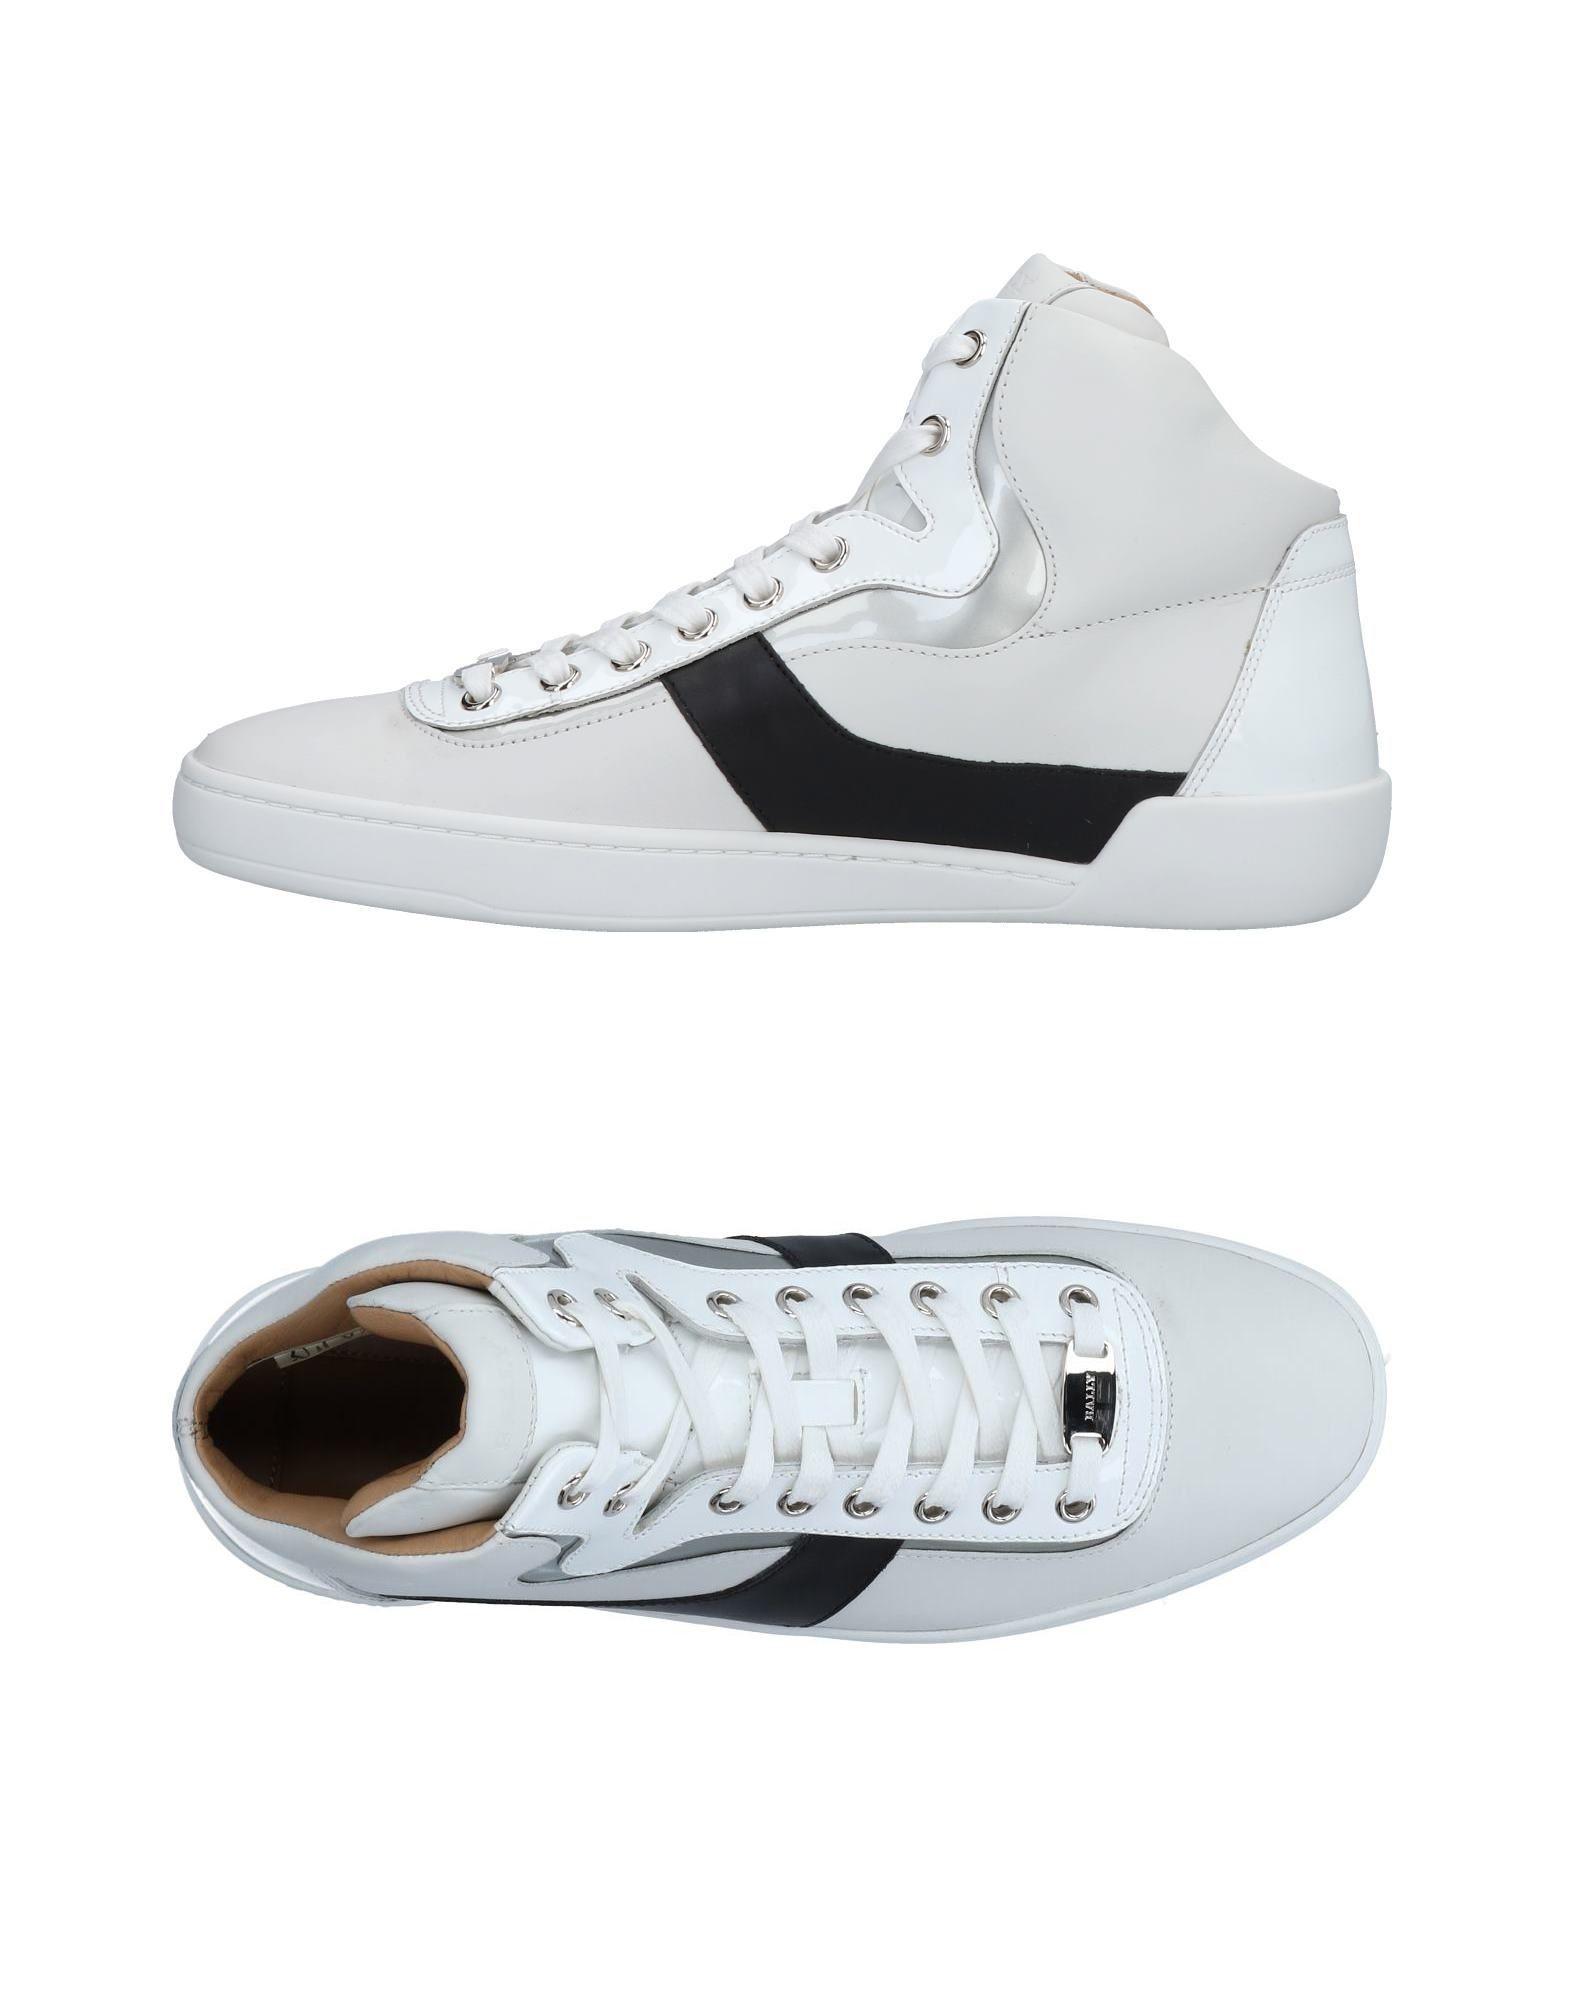 Bally Sneakers Herren  11476631XL Gute Qualität beliebte Schuhe